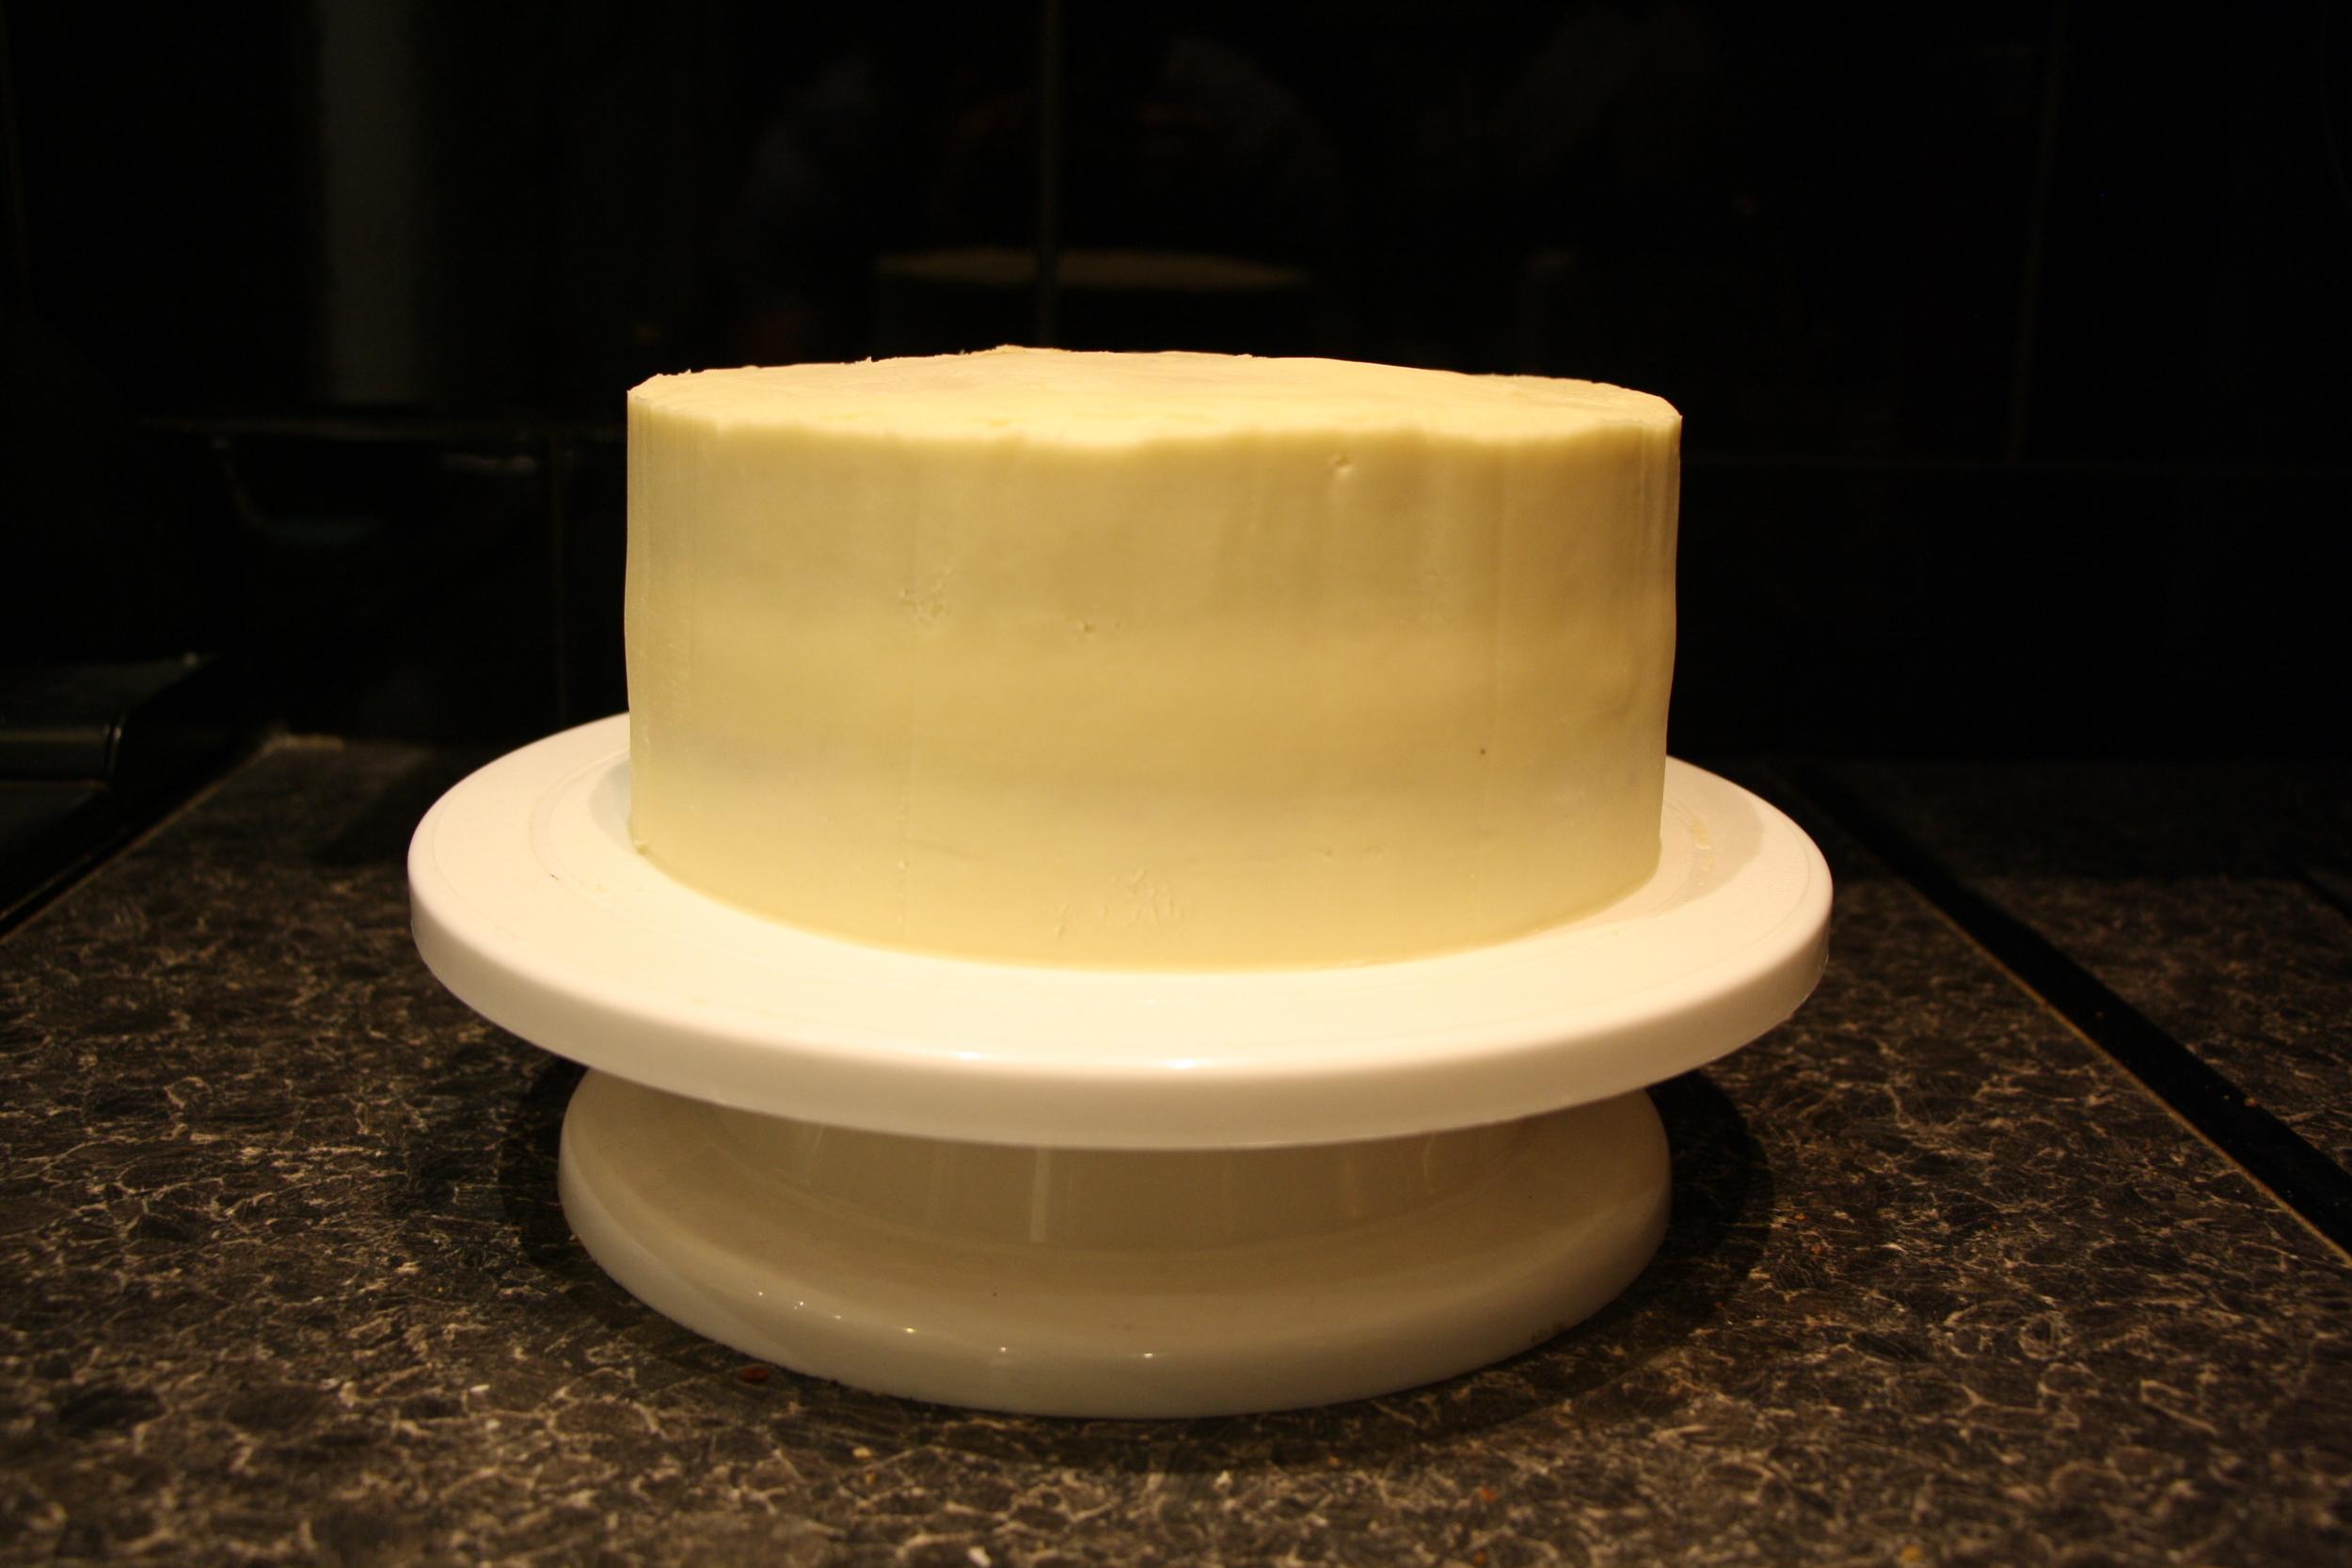 Buttercream coated cake